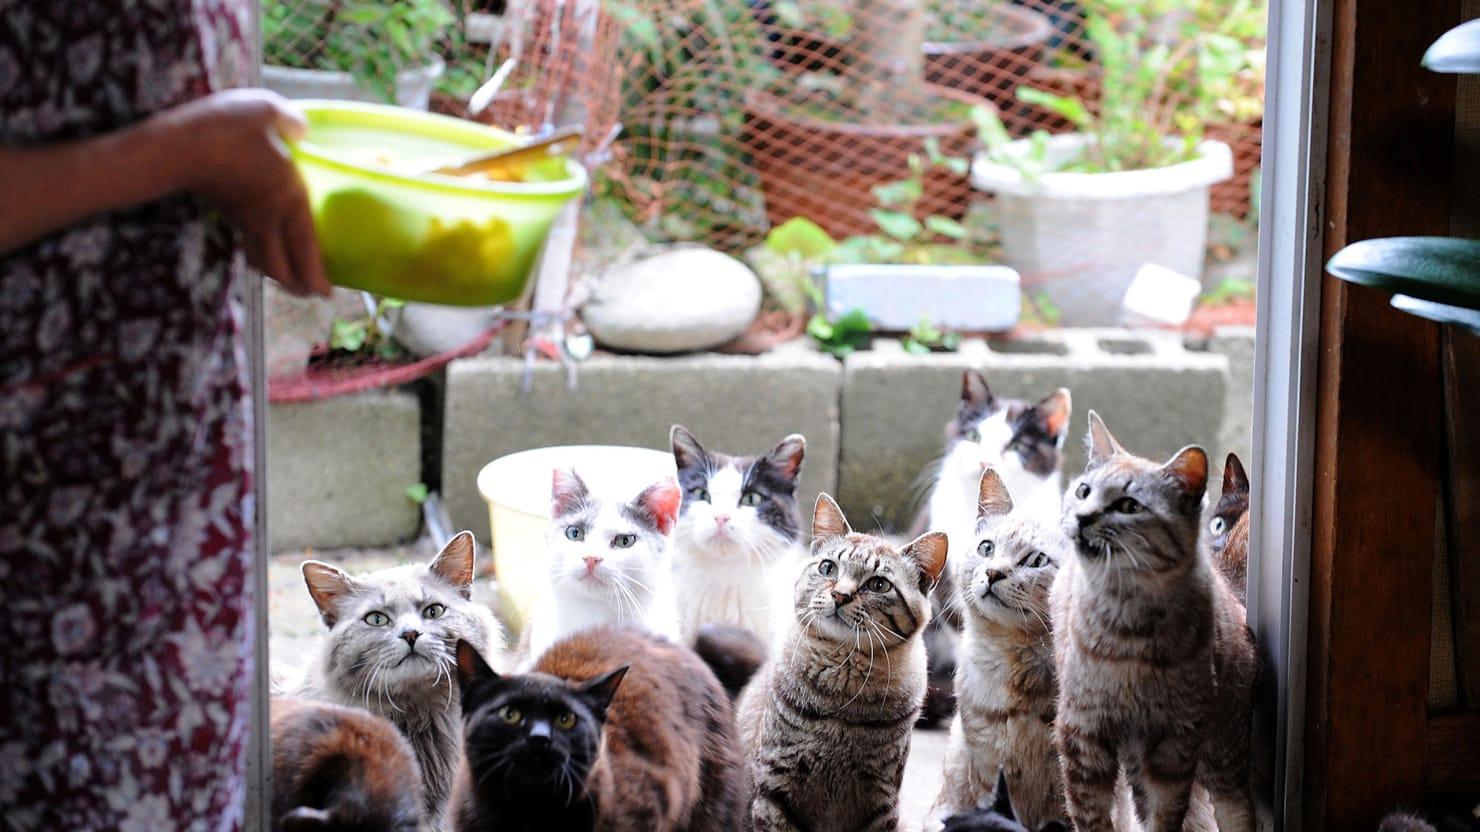 Cats Rule on Japan's Tashirojima Island